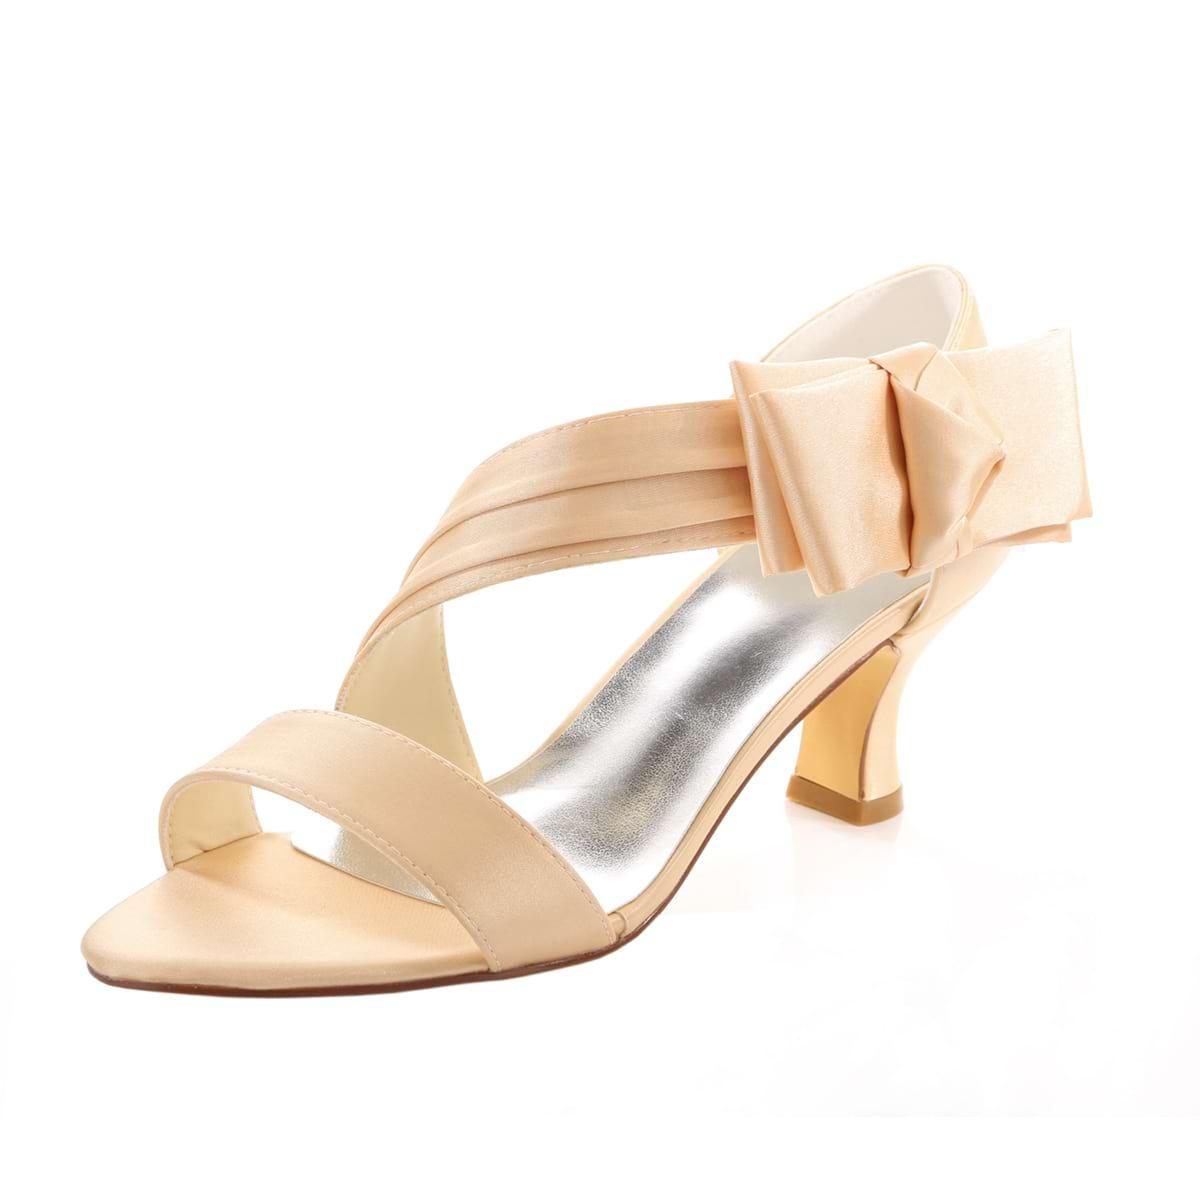 Sandals Wedding Shoes Spool Heel Satin Wedding Shoes